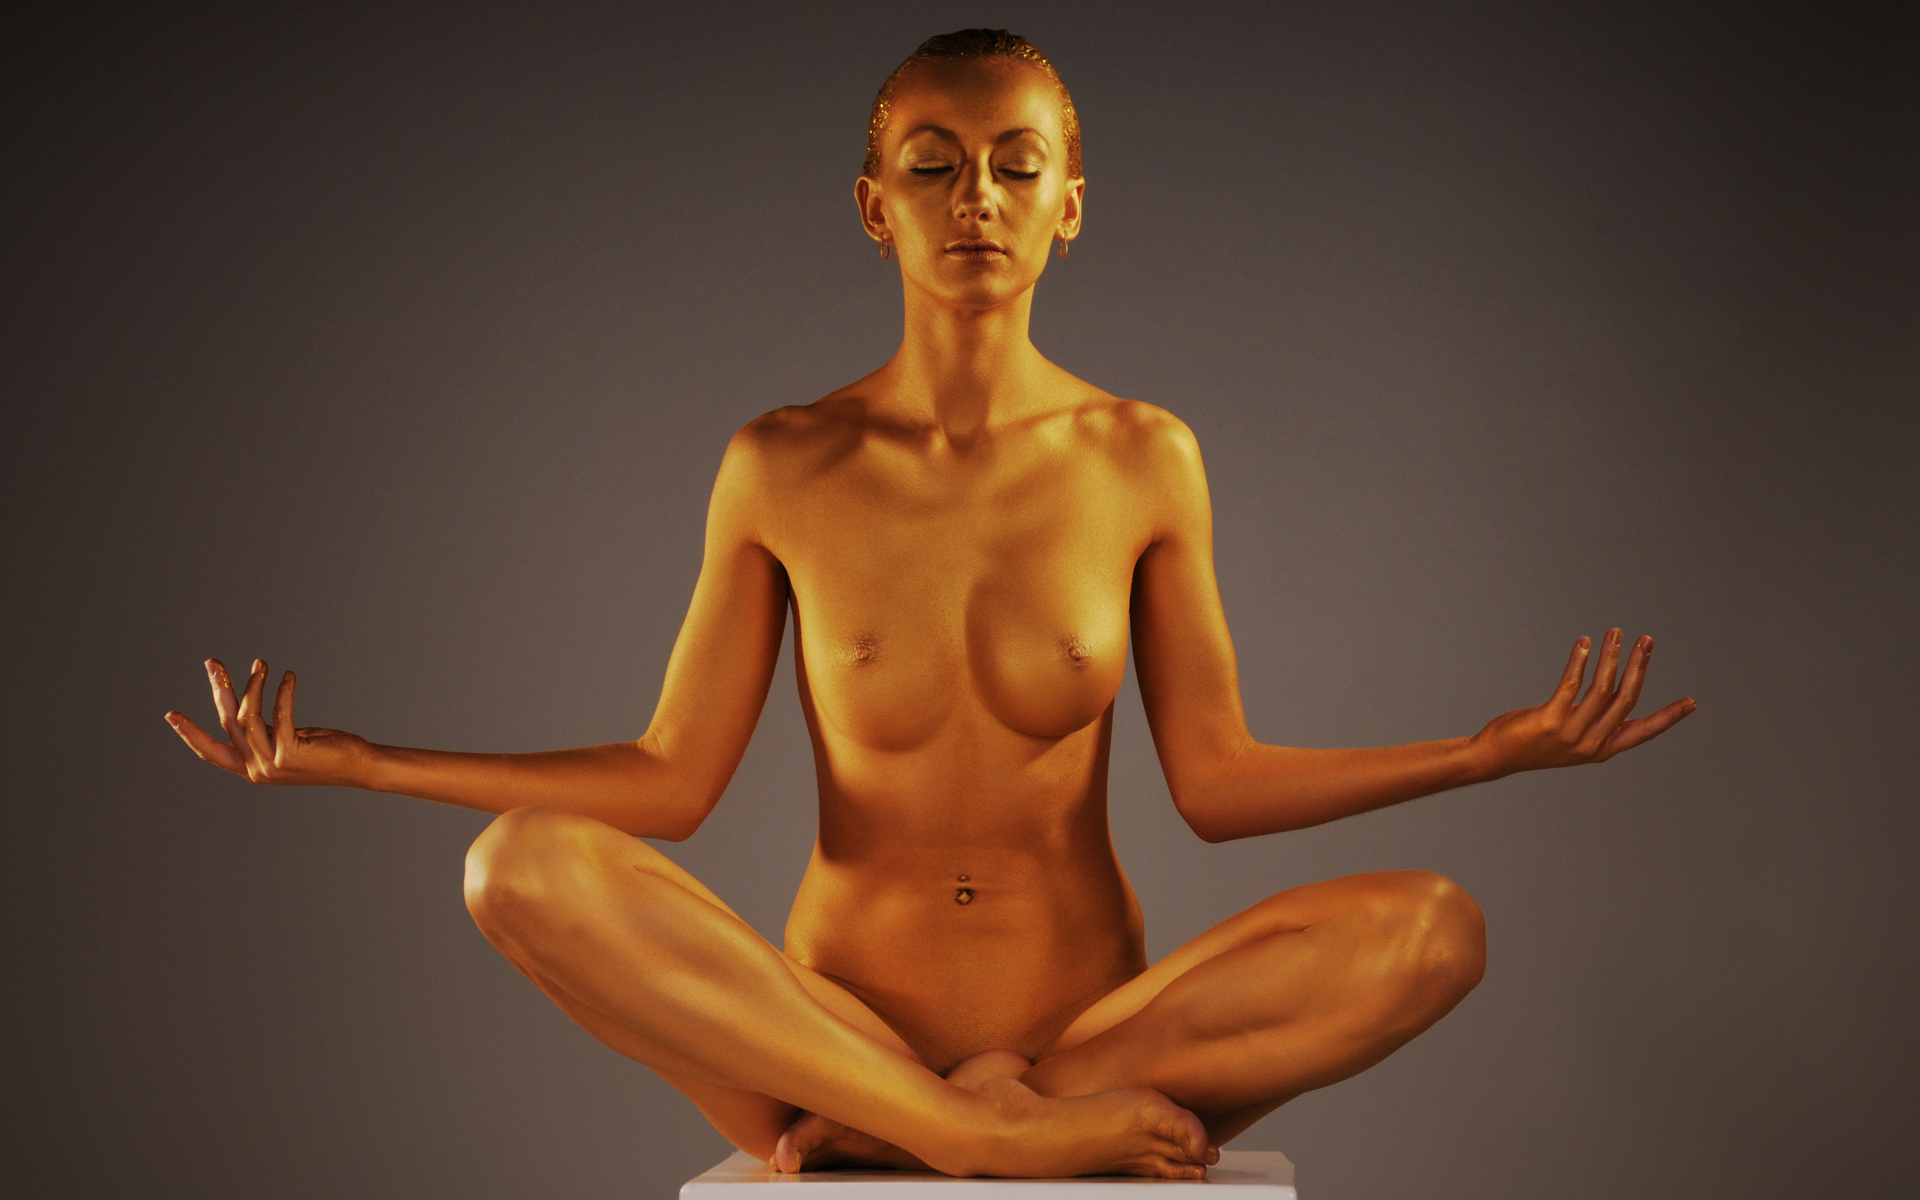 gambar wanita cantik telanjang